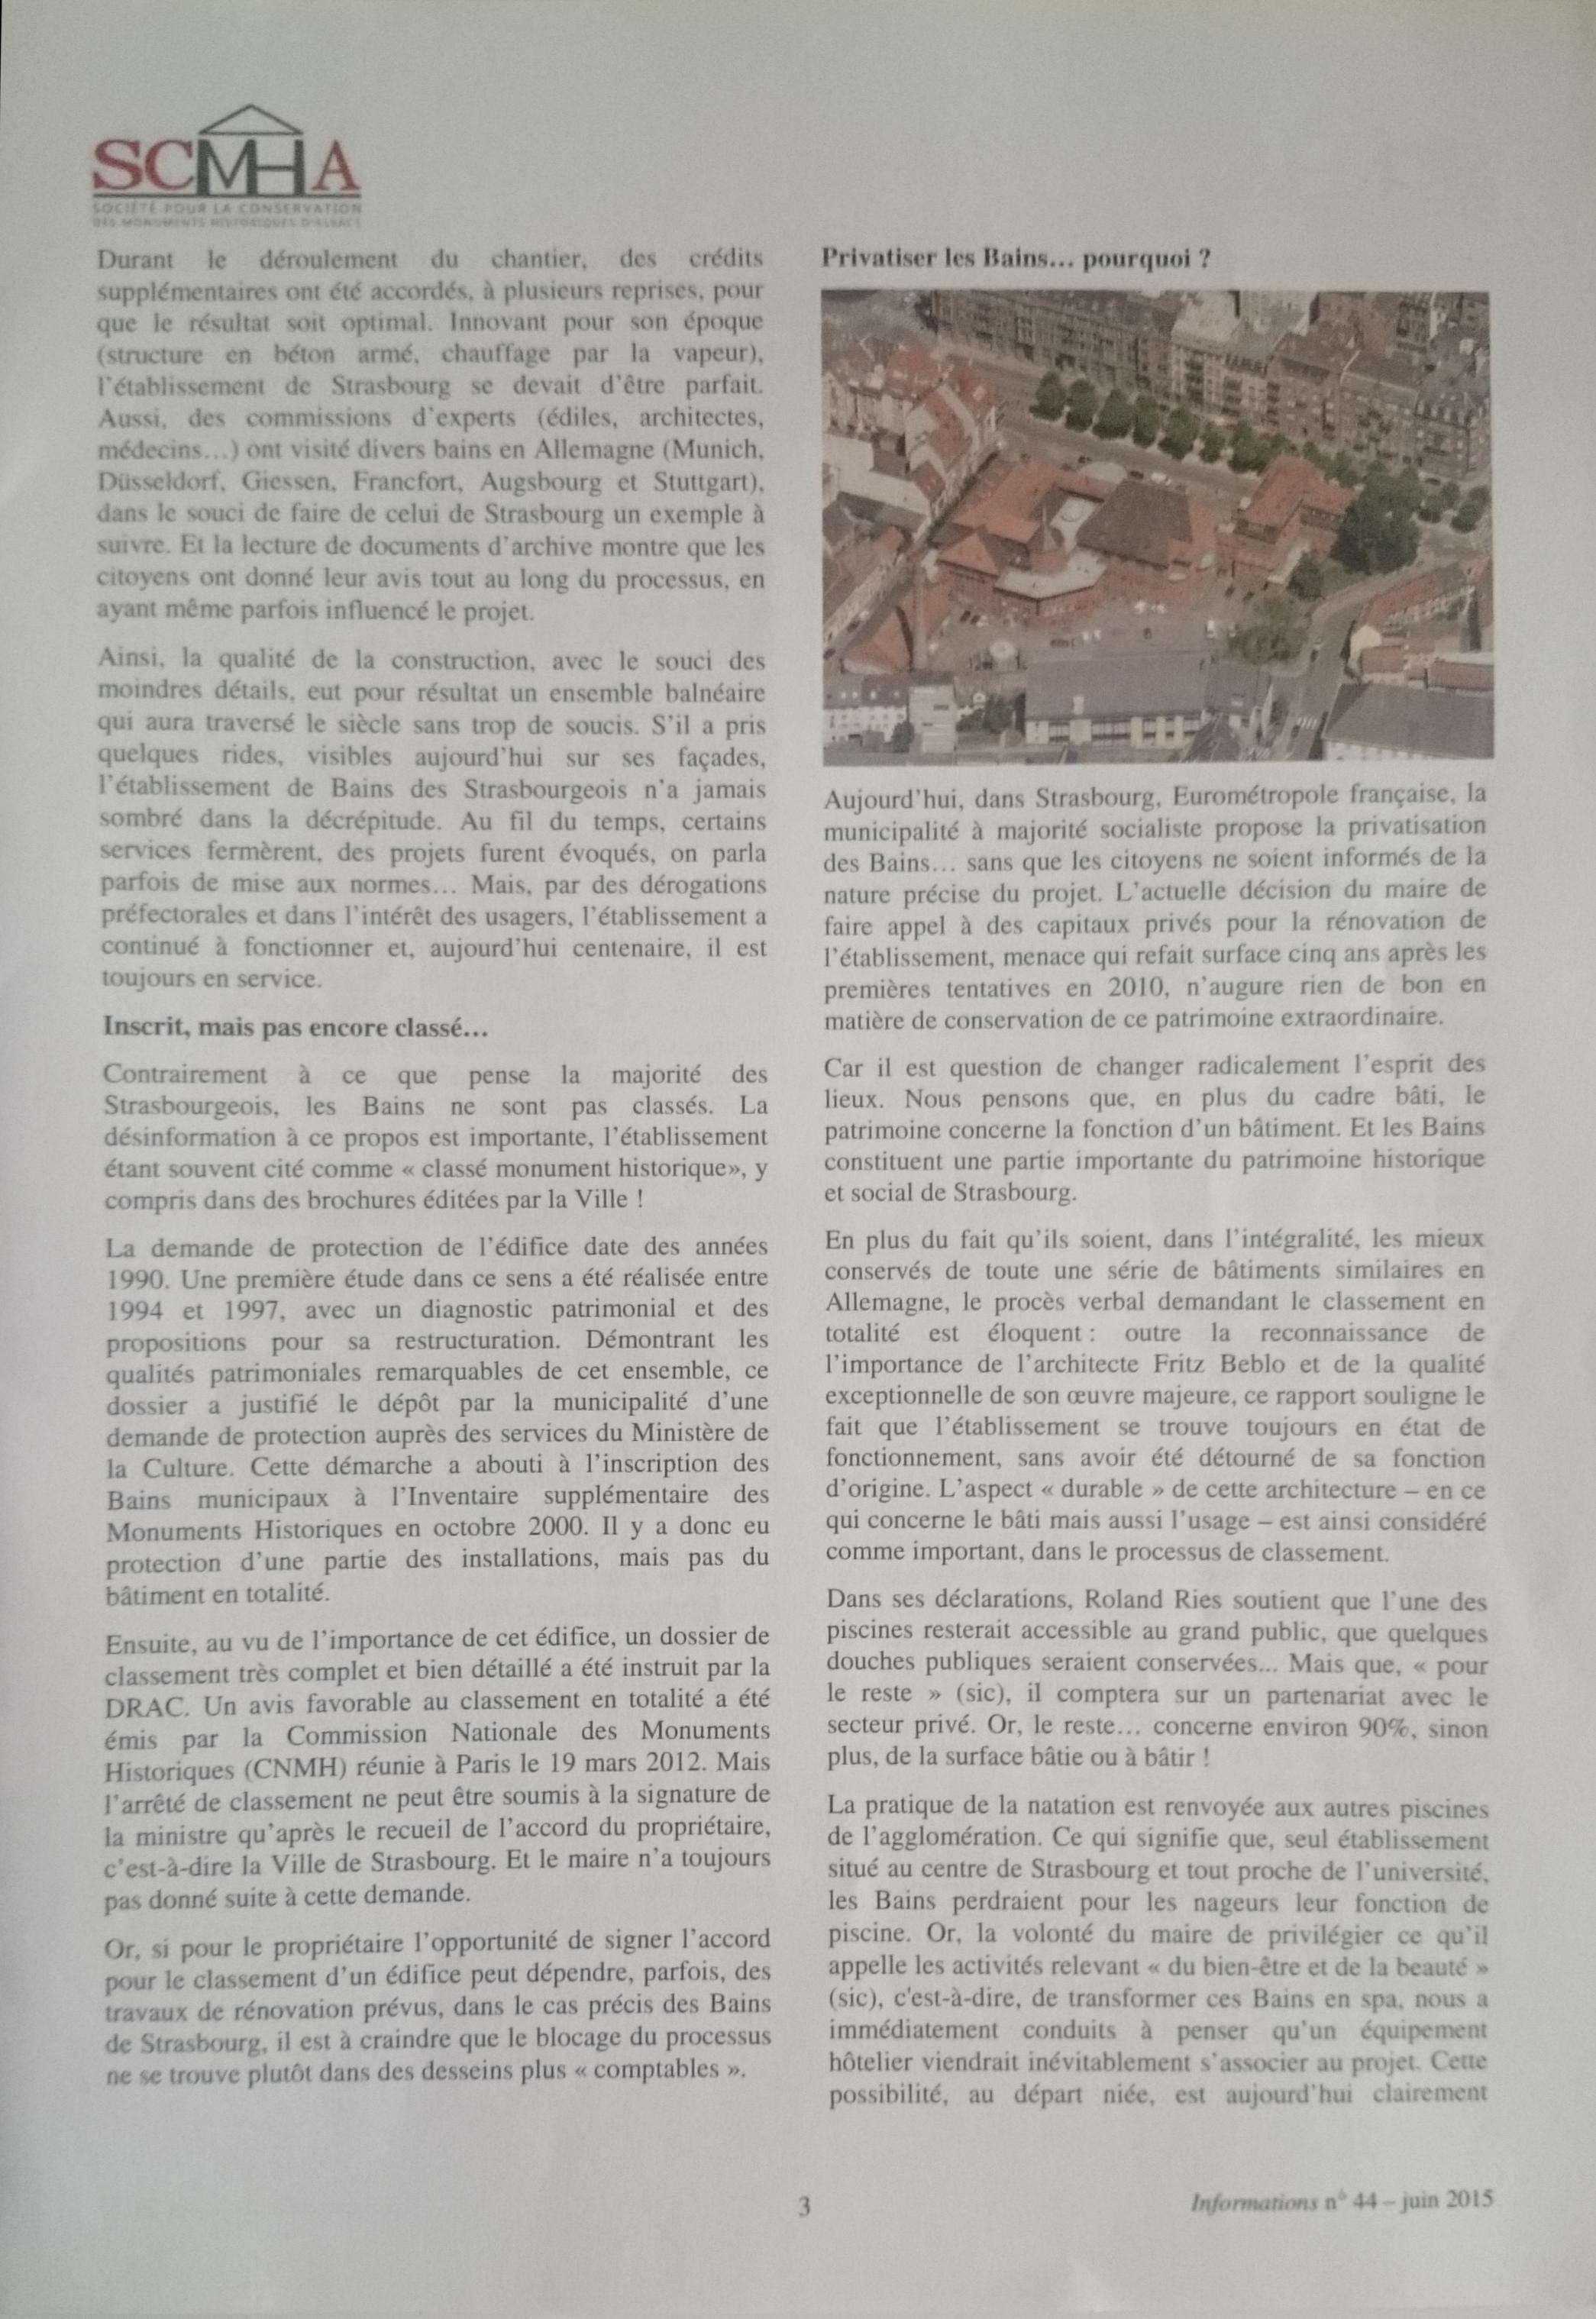 SCMHA_page 3